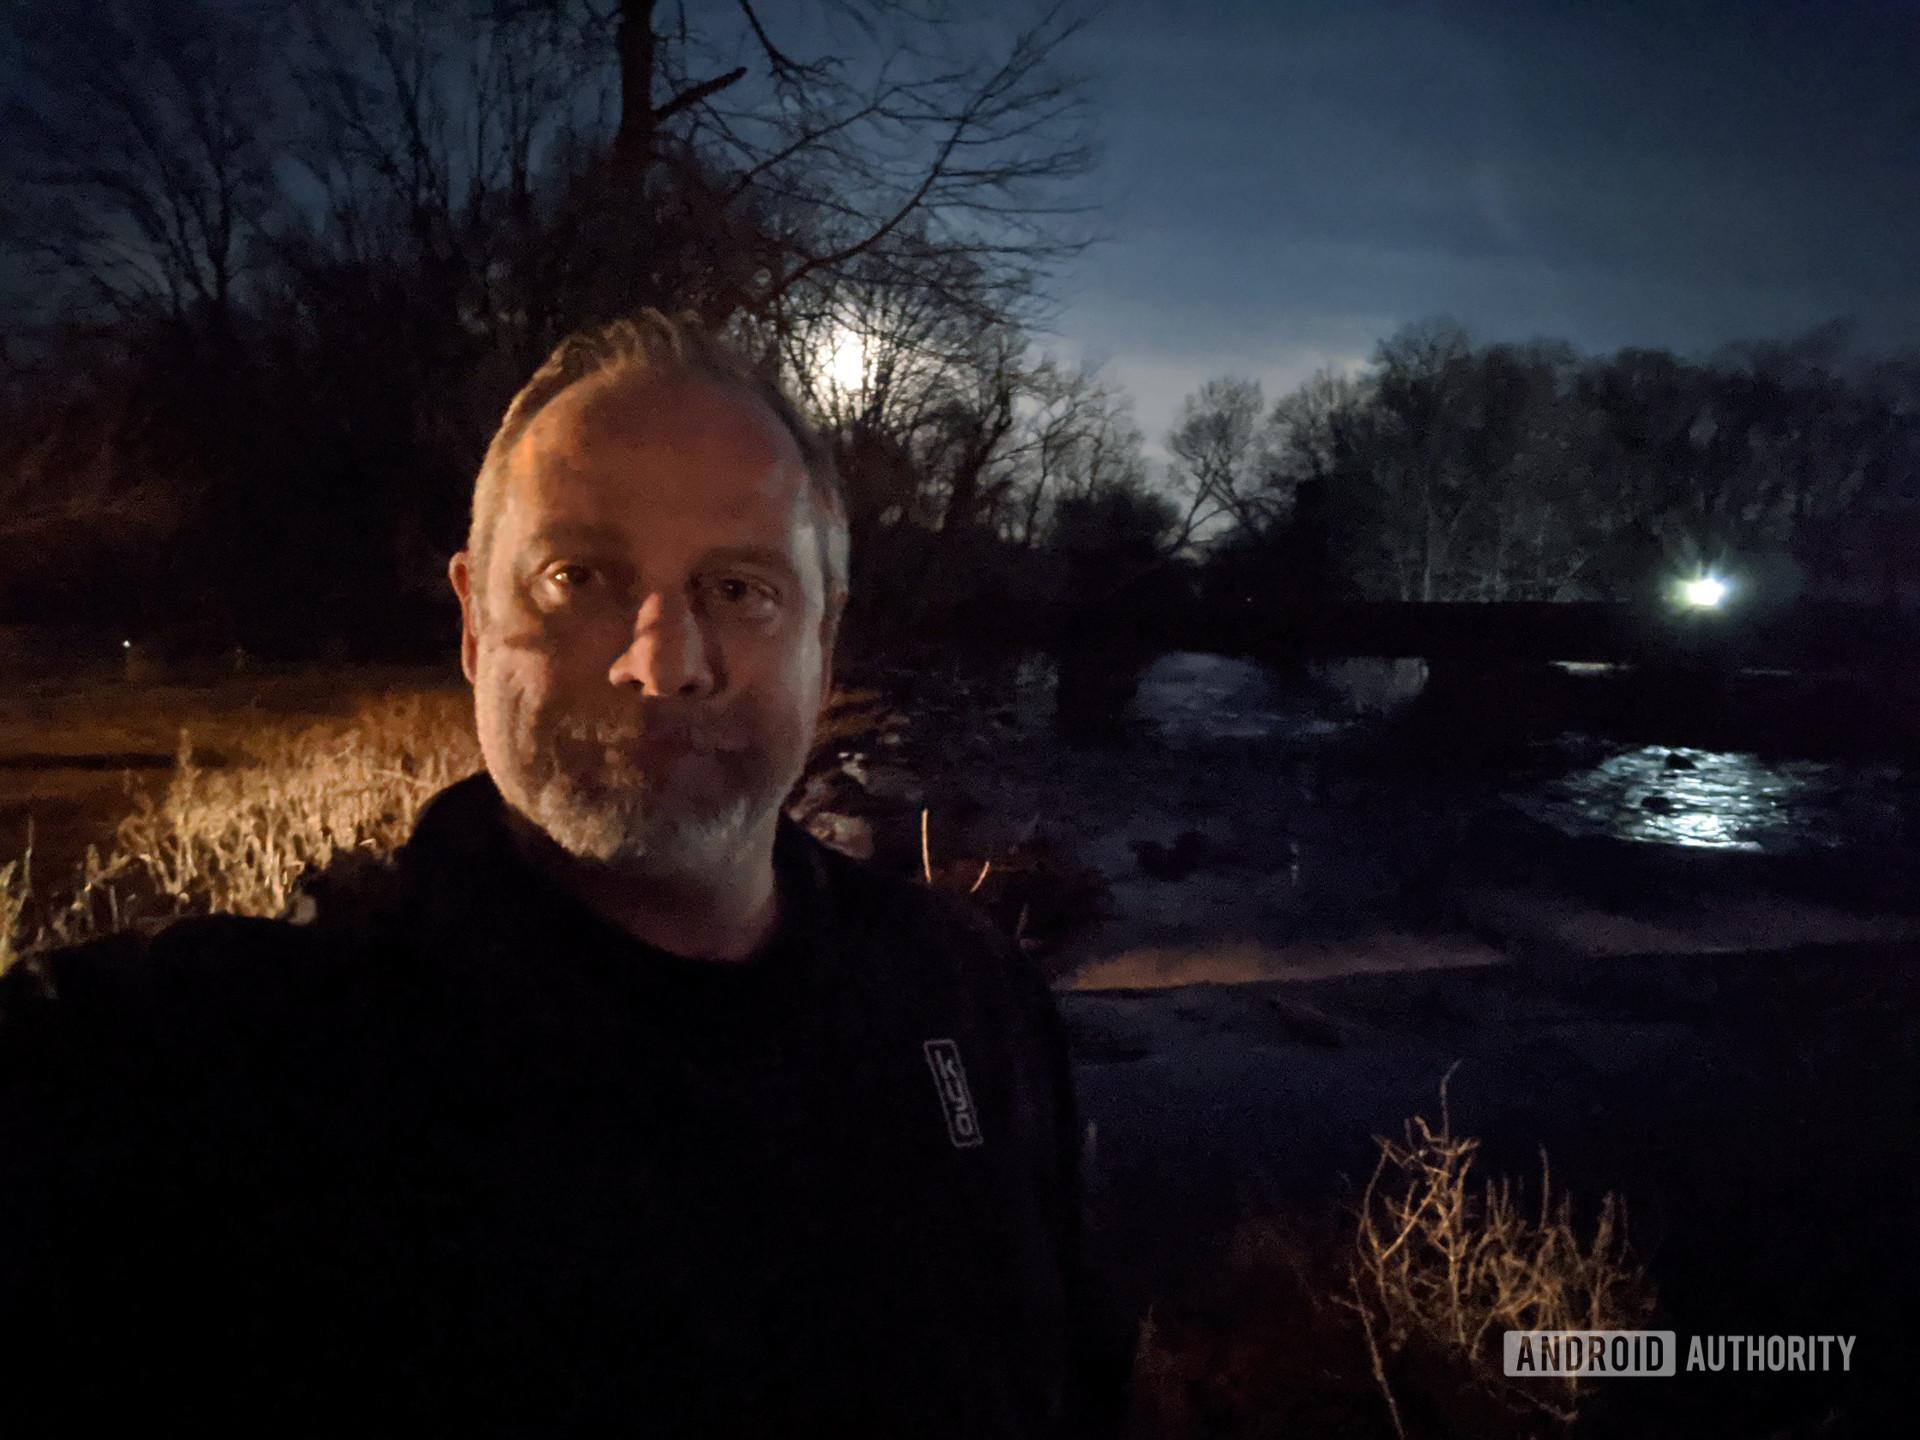 Google Pixel 4 XL camera sample night mode selfie